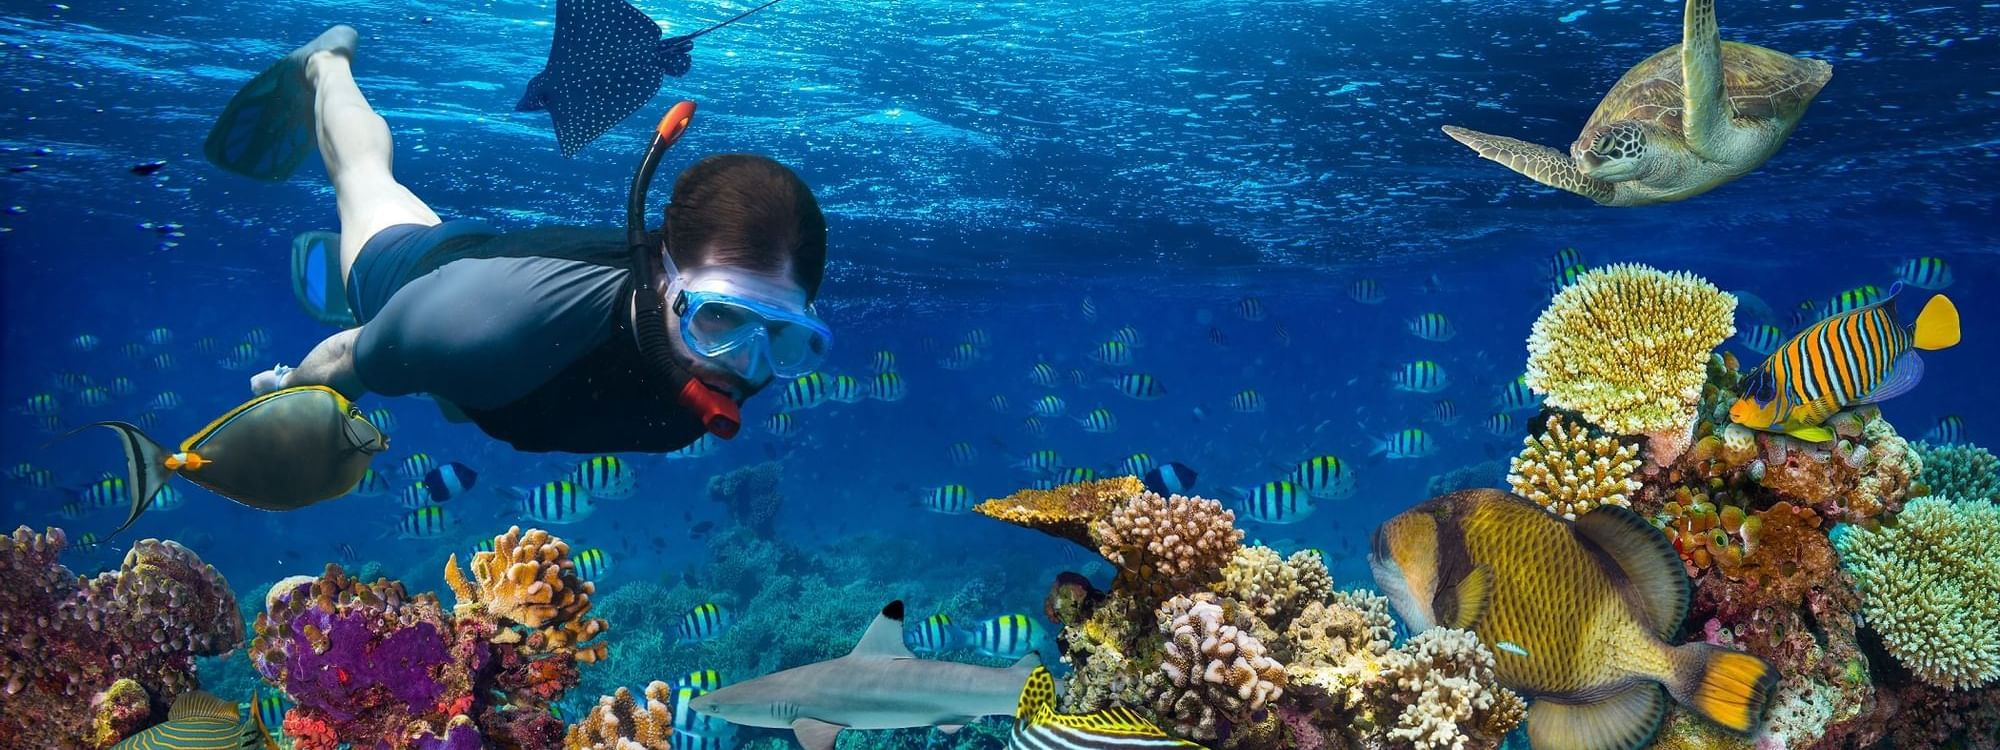 Person snorkeling in deep sea near Daydream Island Resort